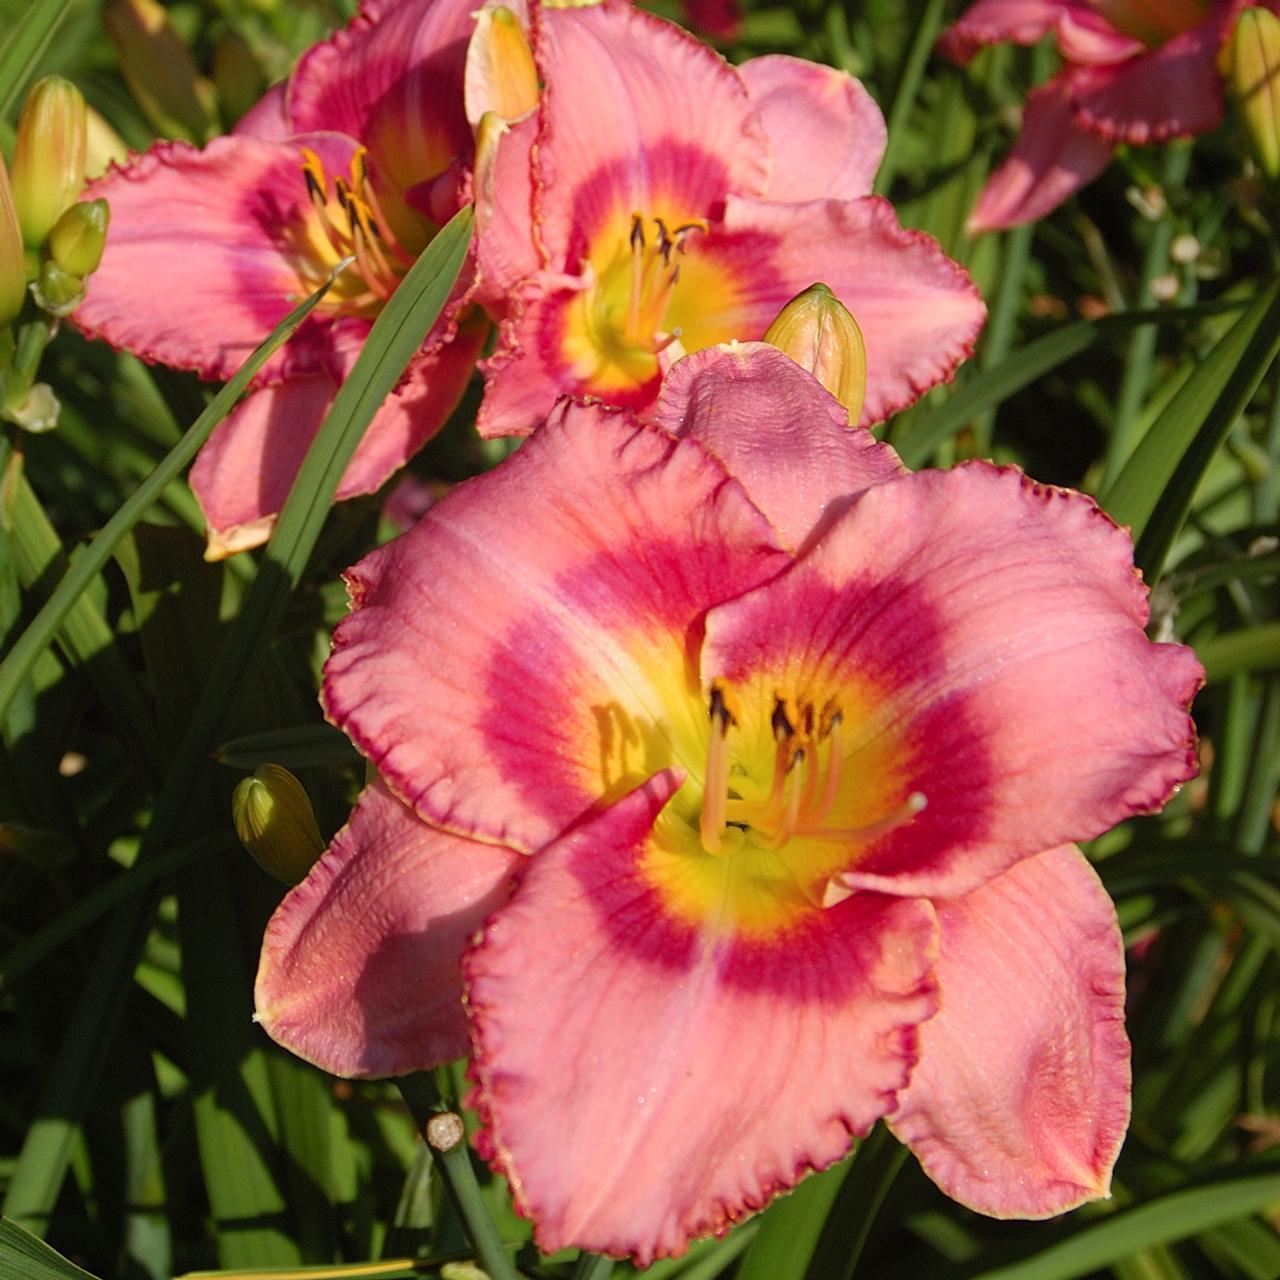 Hemerocallis 'Dress Pink' plant